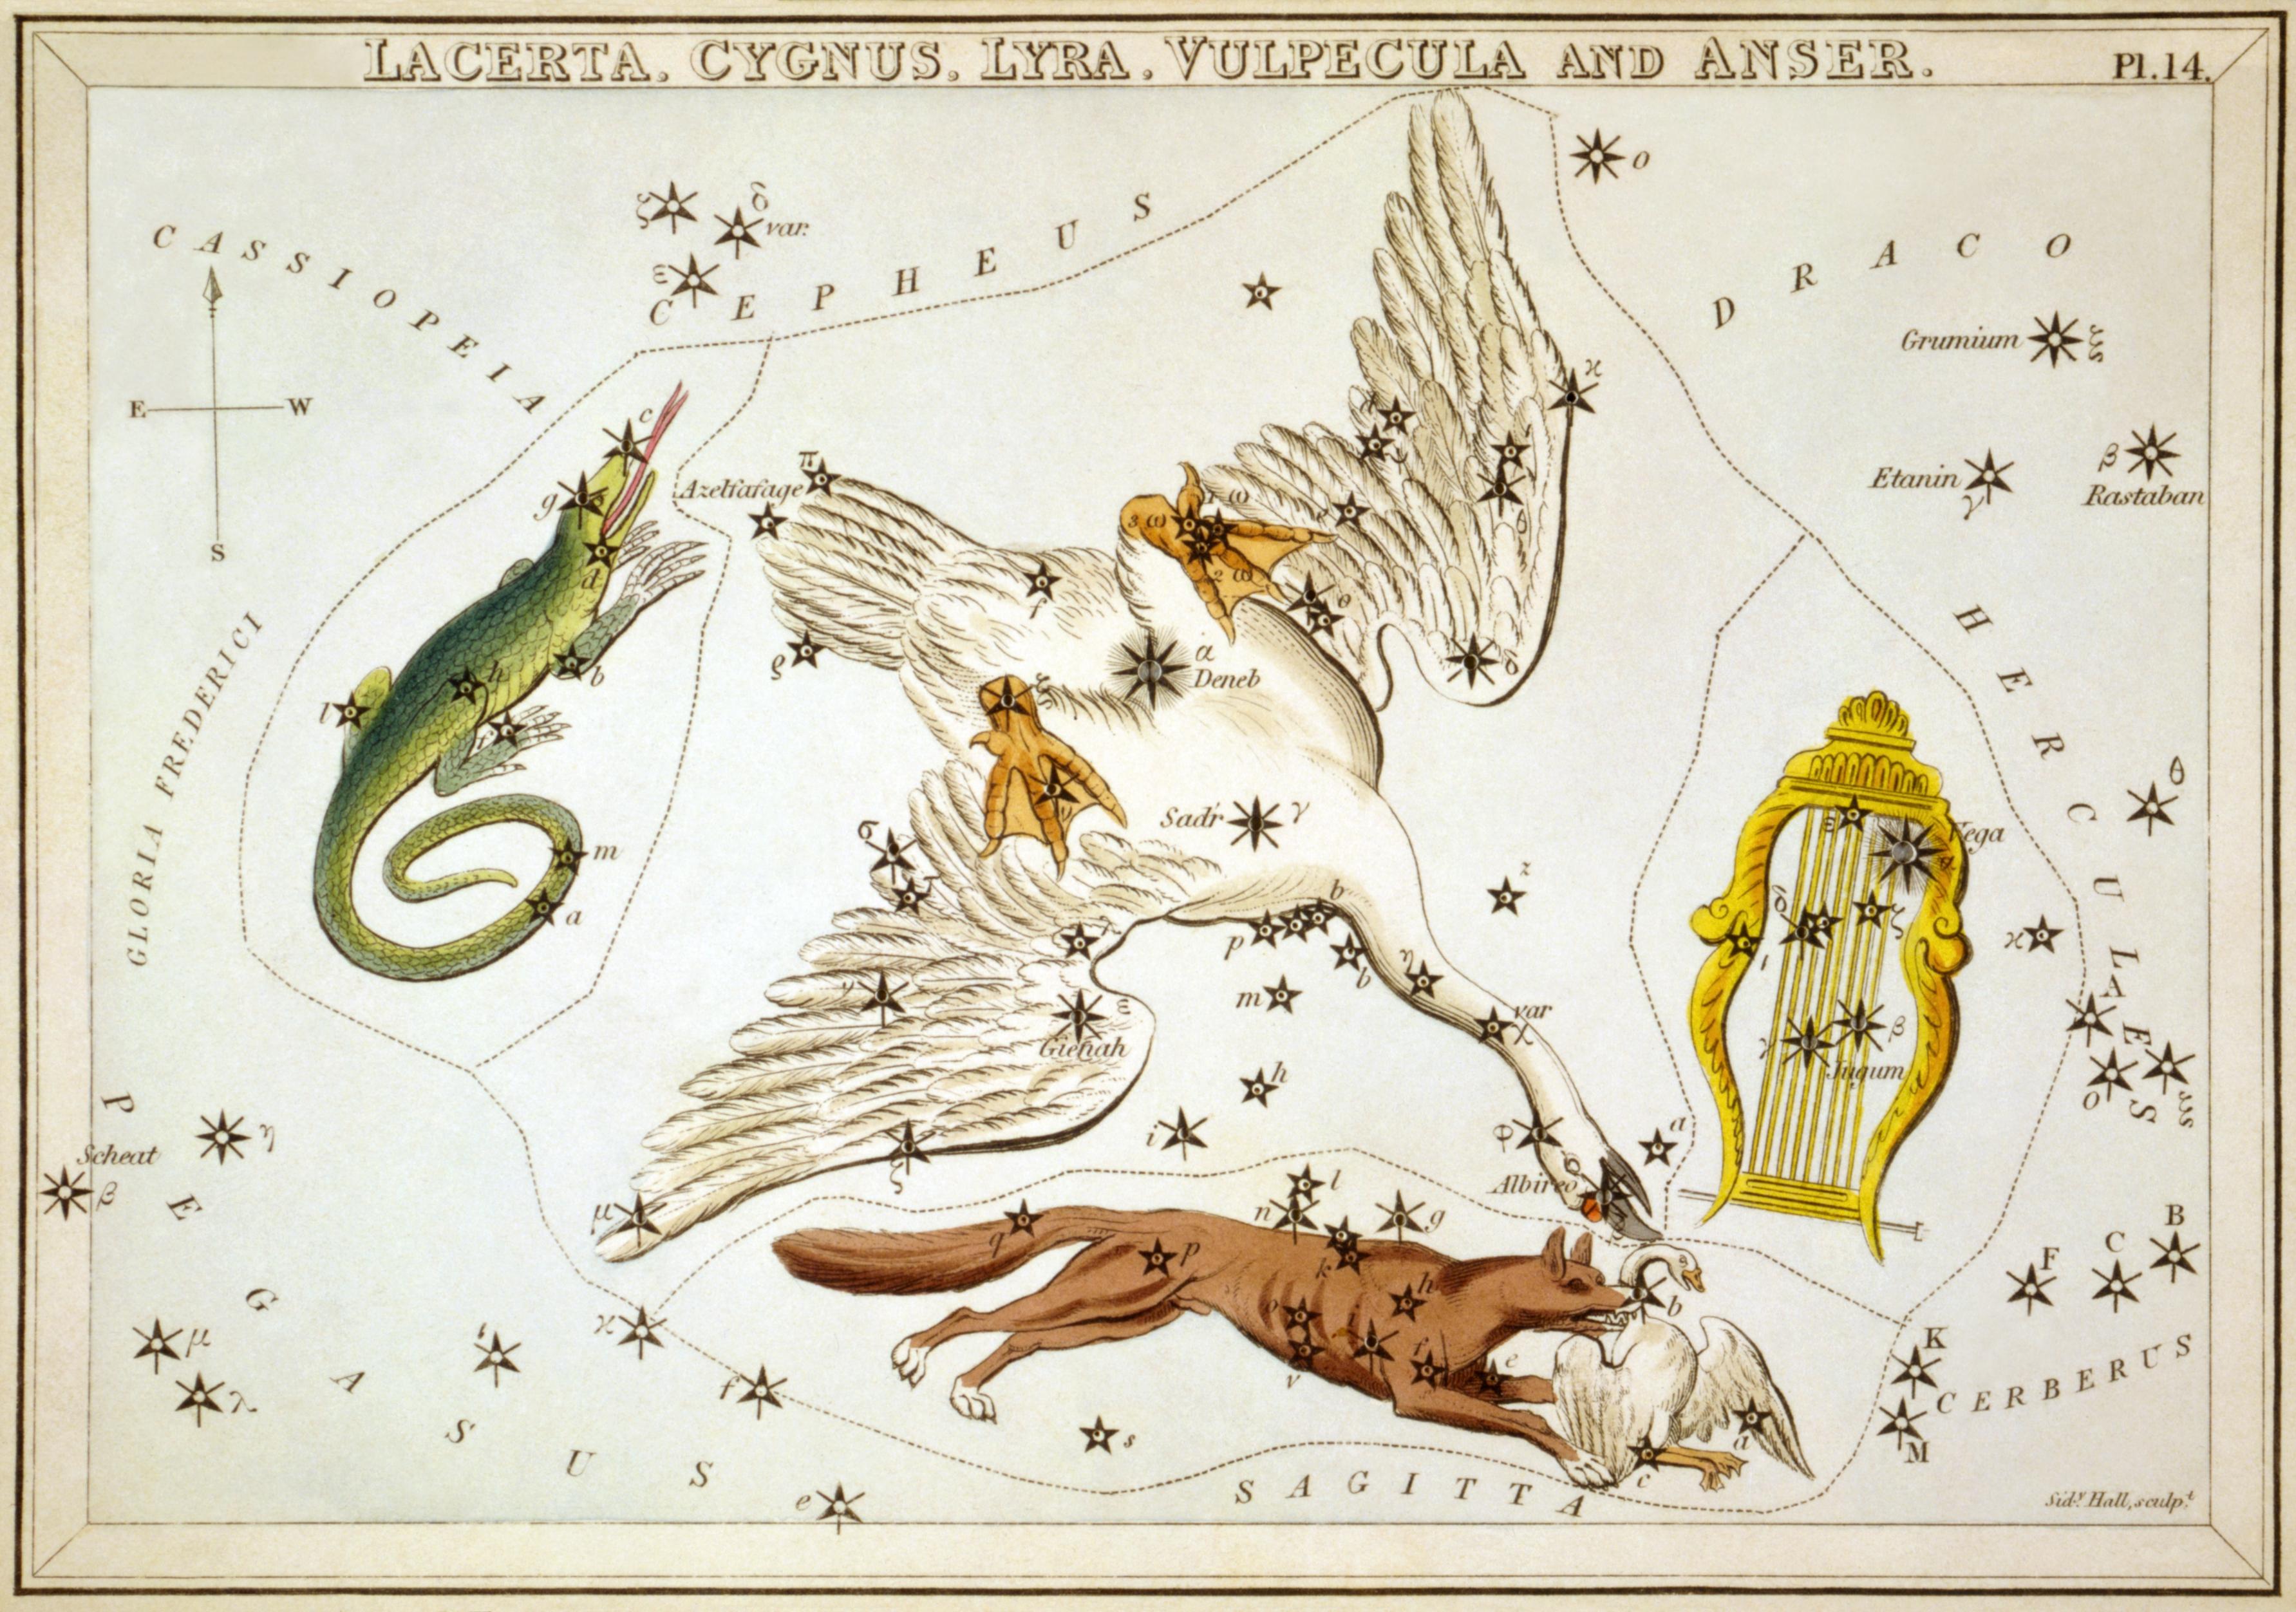 Карточка №14: Ящерица, Лебедь, Лира, и Лисичка с Гусем